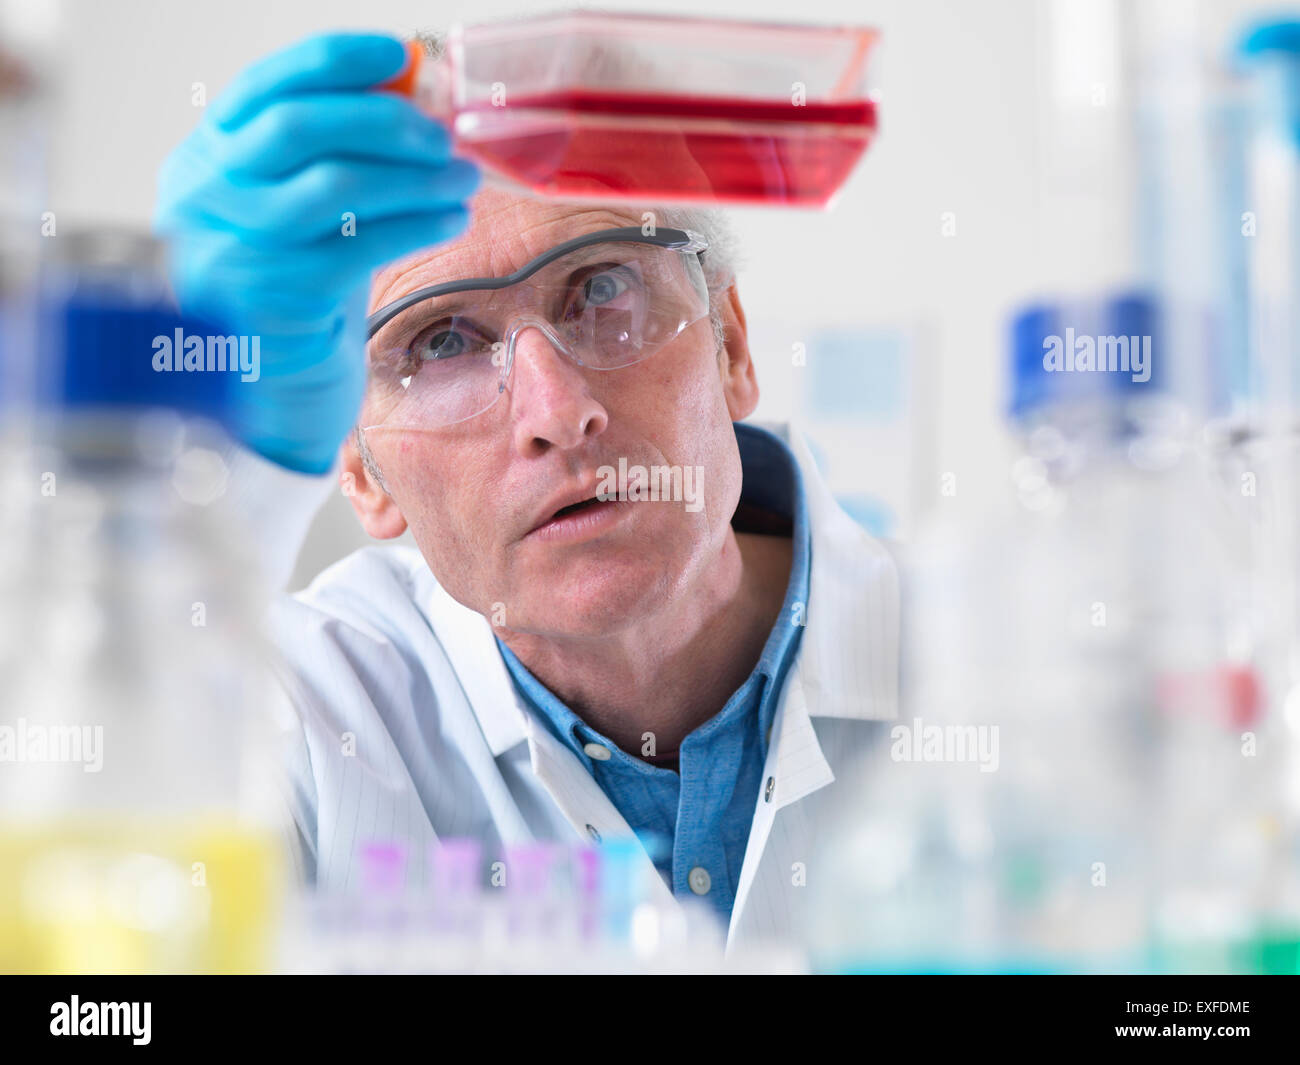 Cerca del biólogo celular sosteniendo un matraz conteniendo células madre Foto de stock